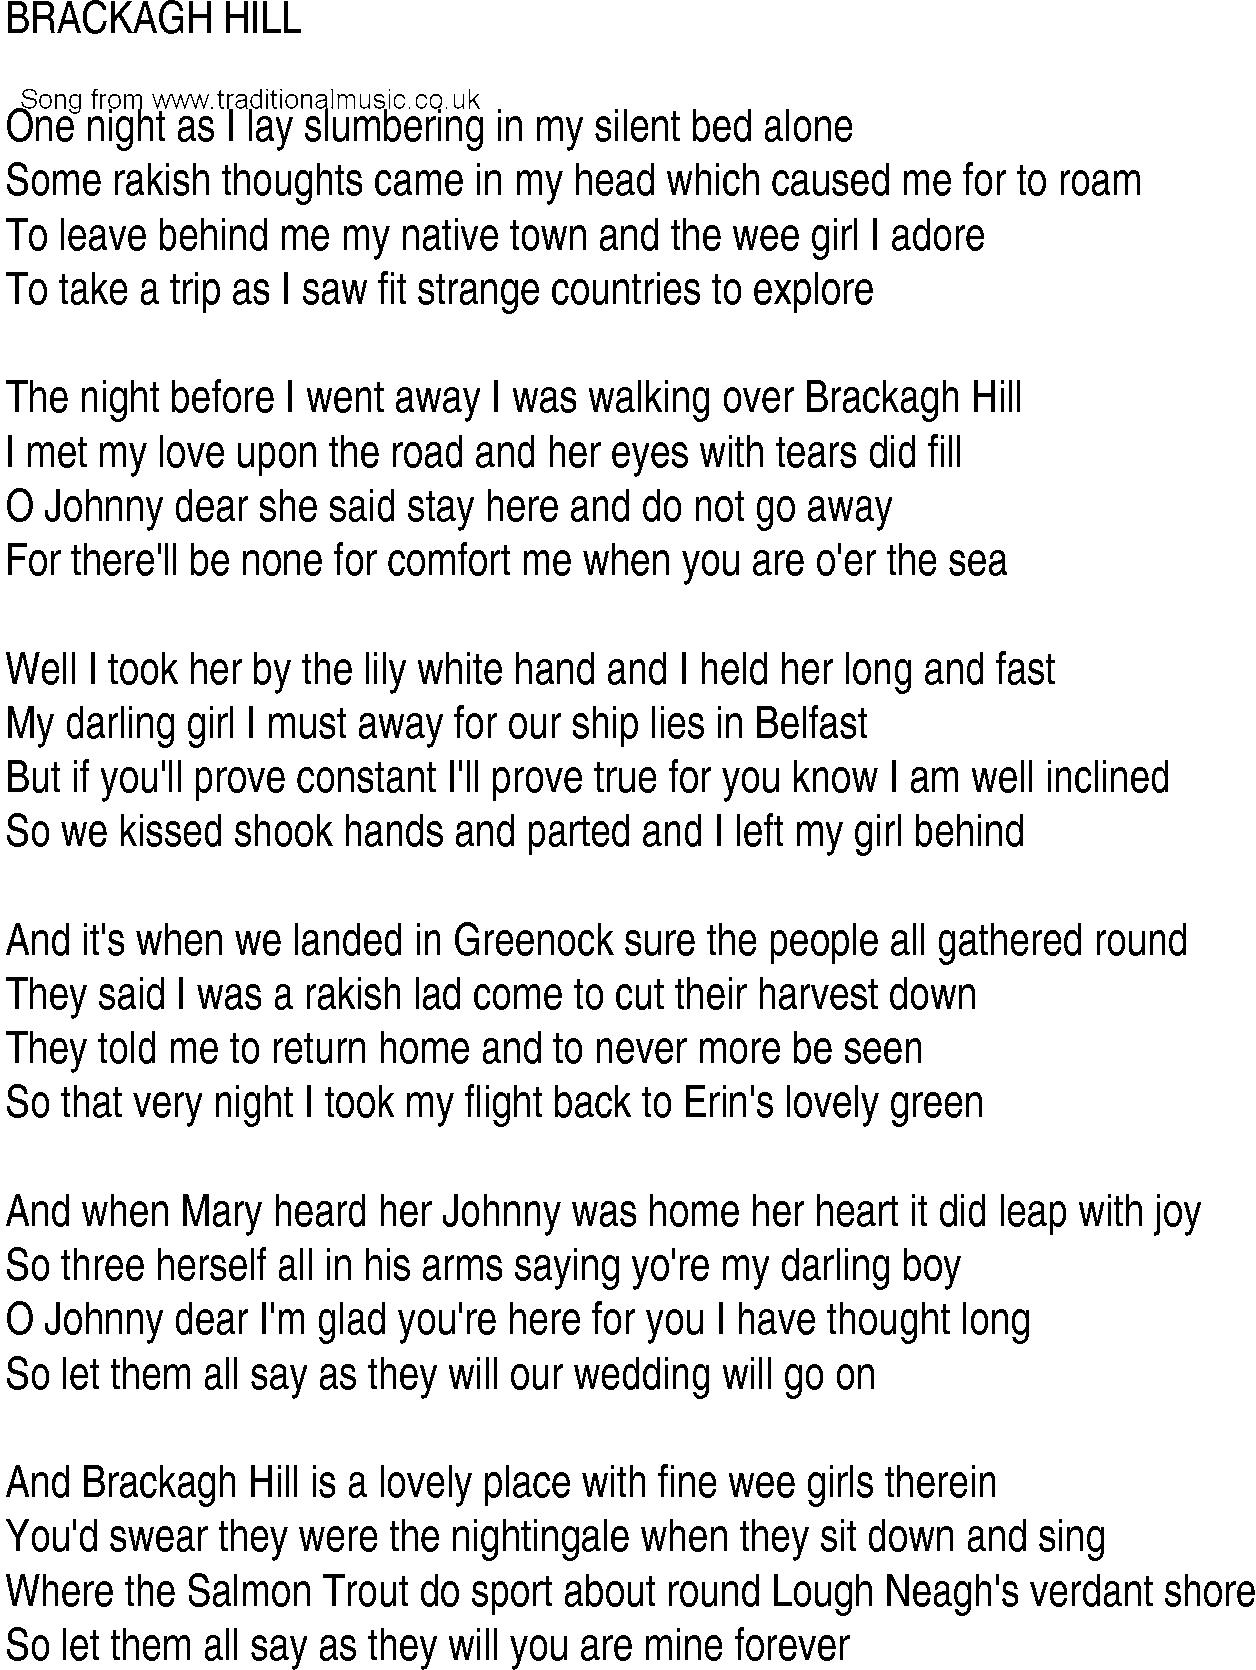 Irish Music Song And Ballad Lyrics For Brackagh Hill